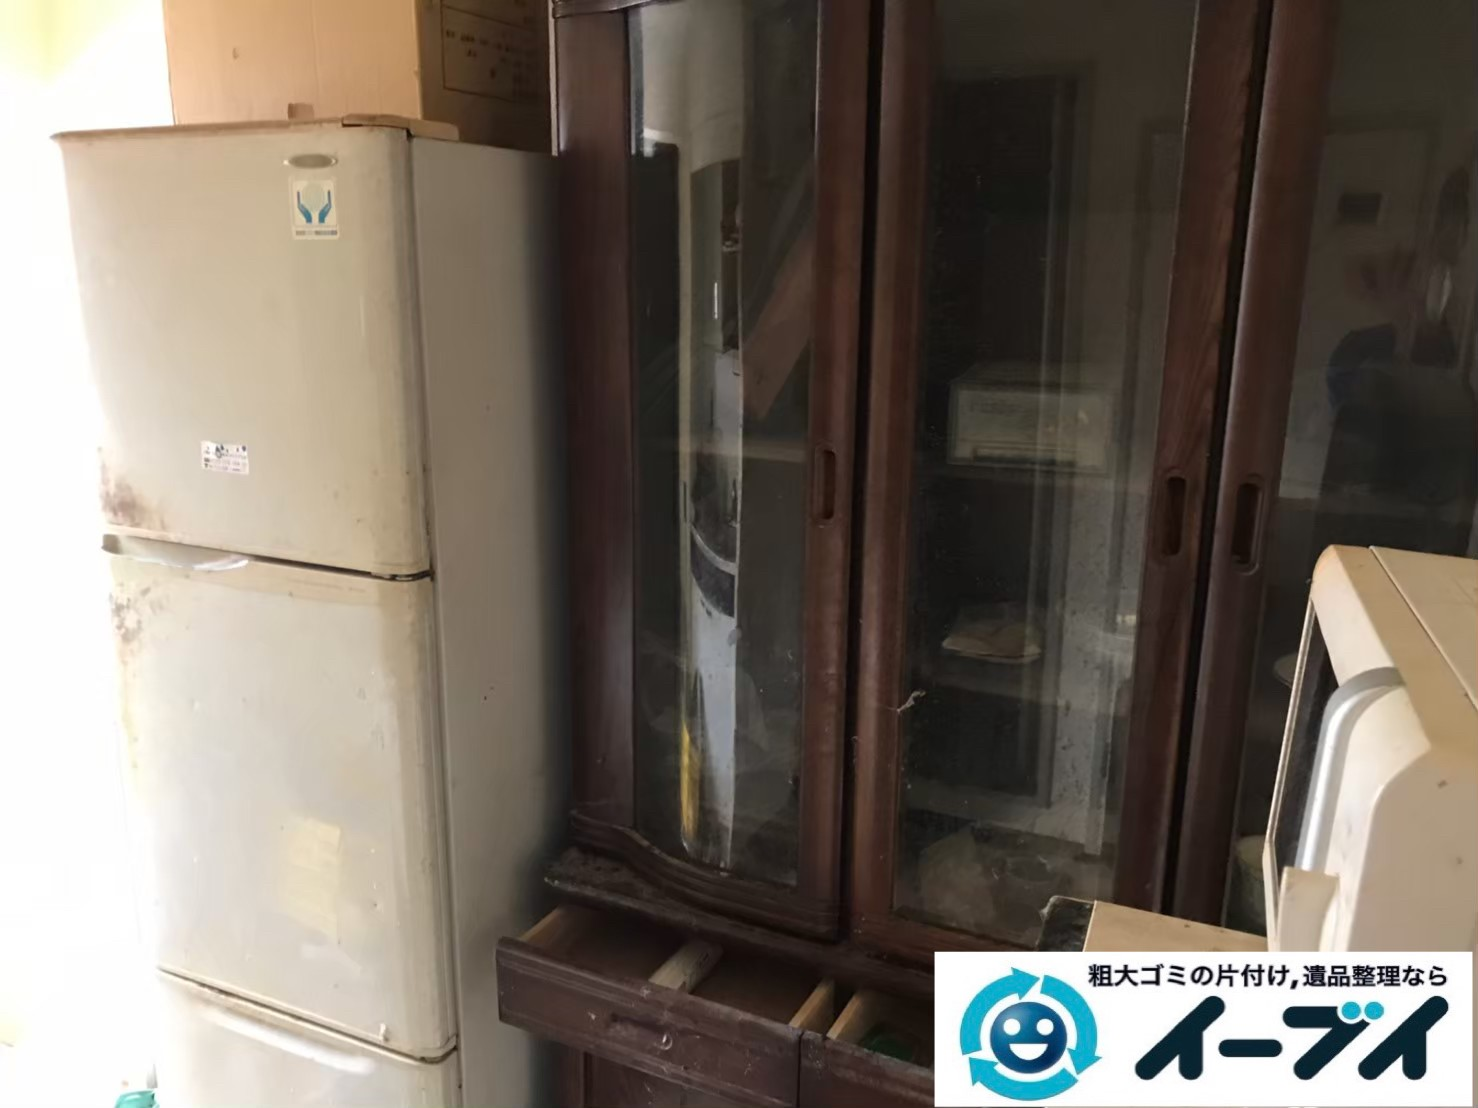 7月30日大阪府大阪市住之江区で食器棚の大型家具、冷蔵庫の家電処分の不用品回収。写真3